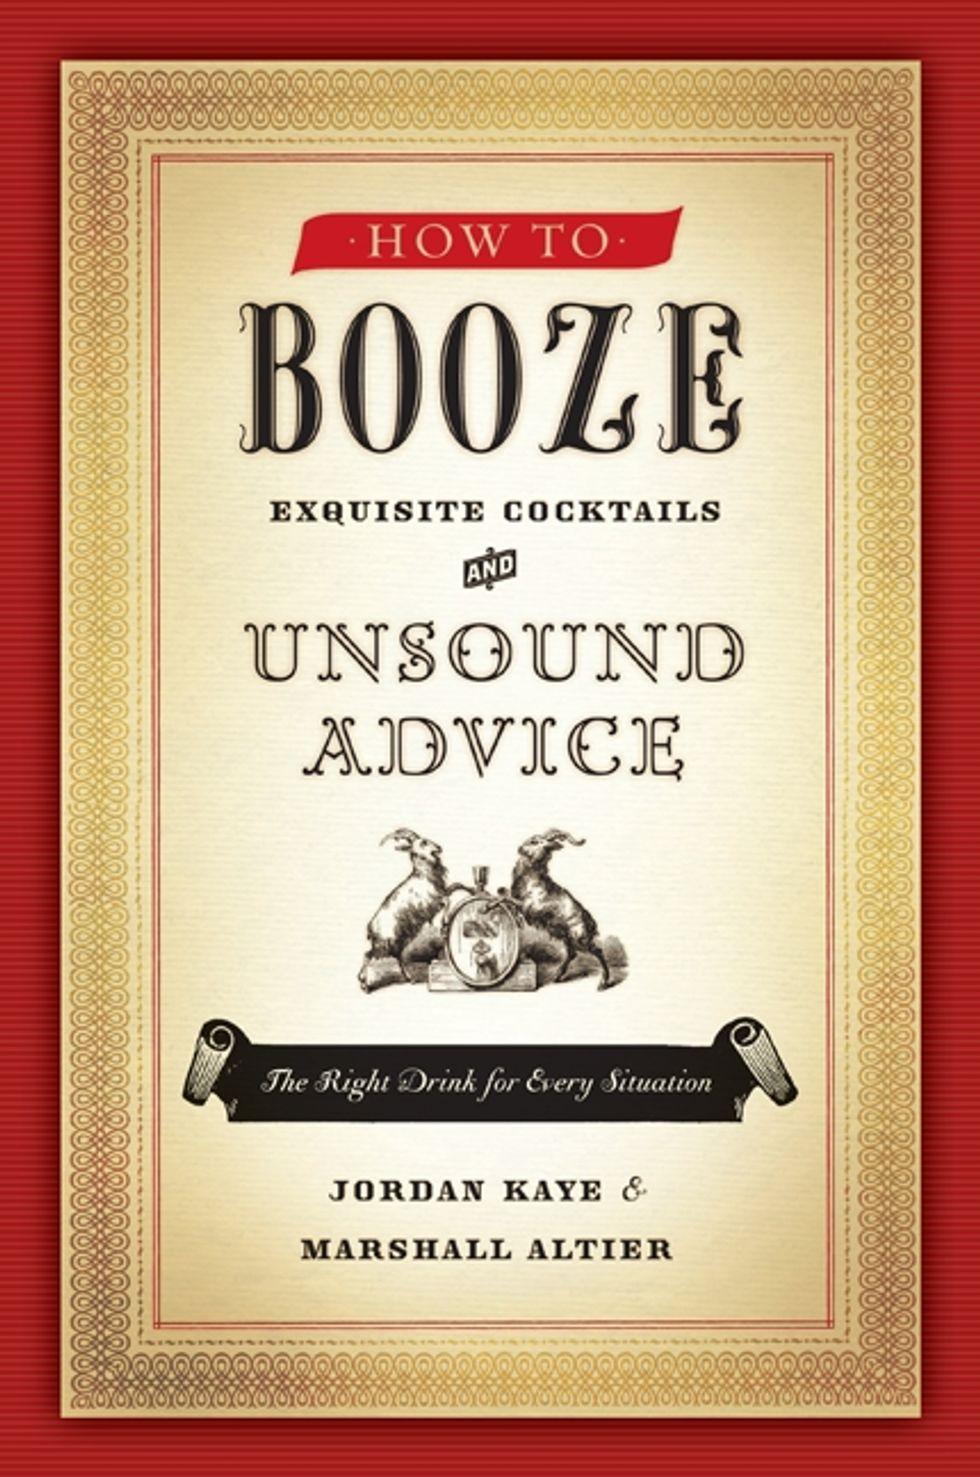 Jordan Kaye and Marshall Altier Tell Us How to Booze